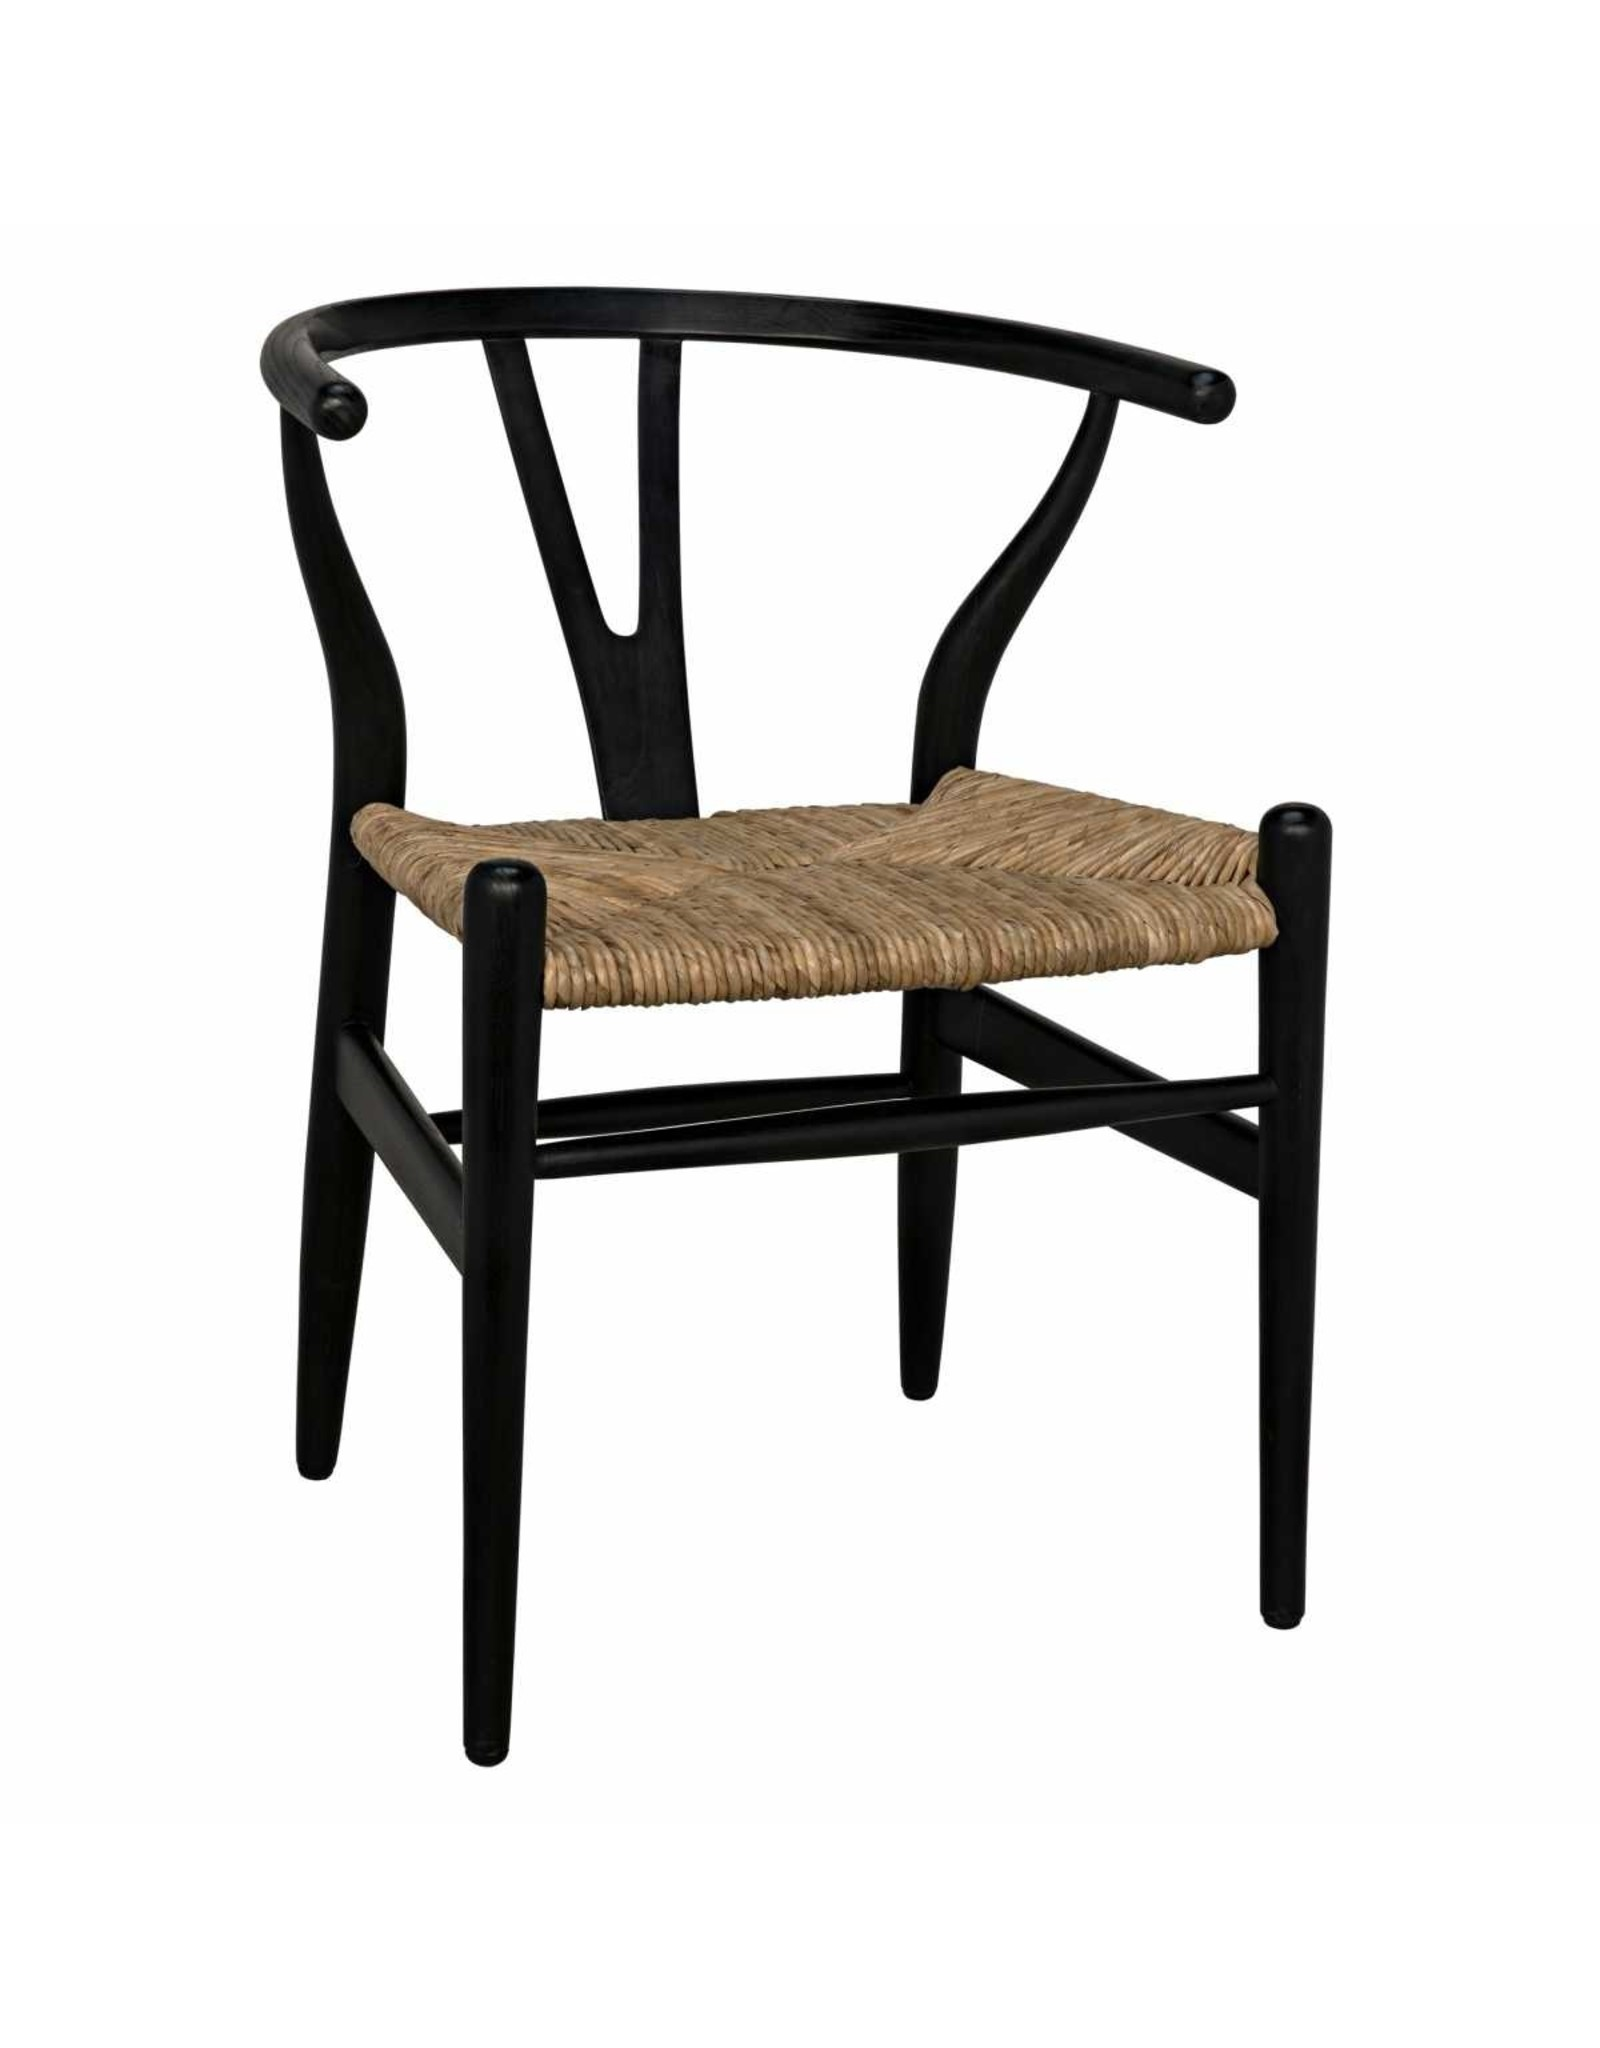 Website Noir Zola Chair - Charcoal Black w/Rush Seat